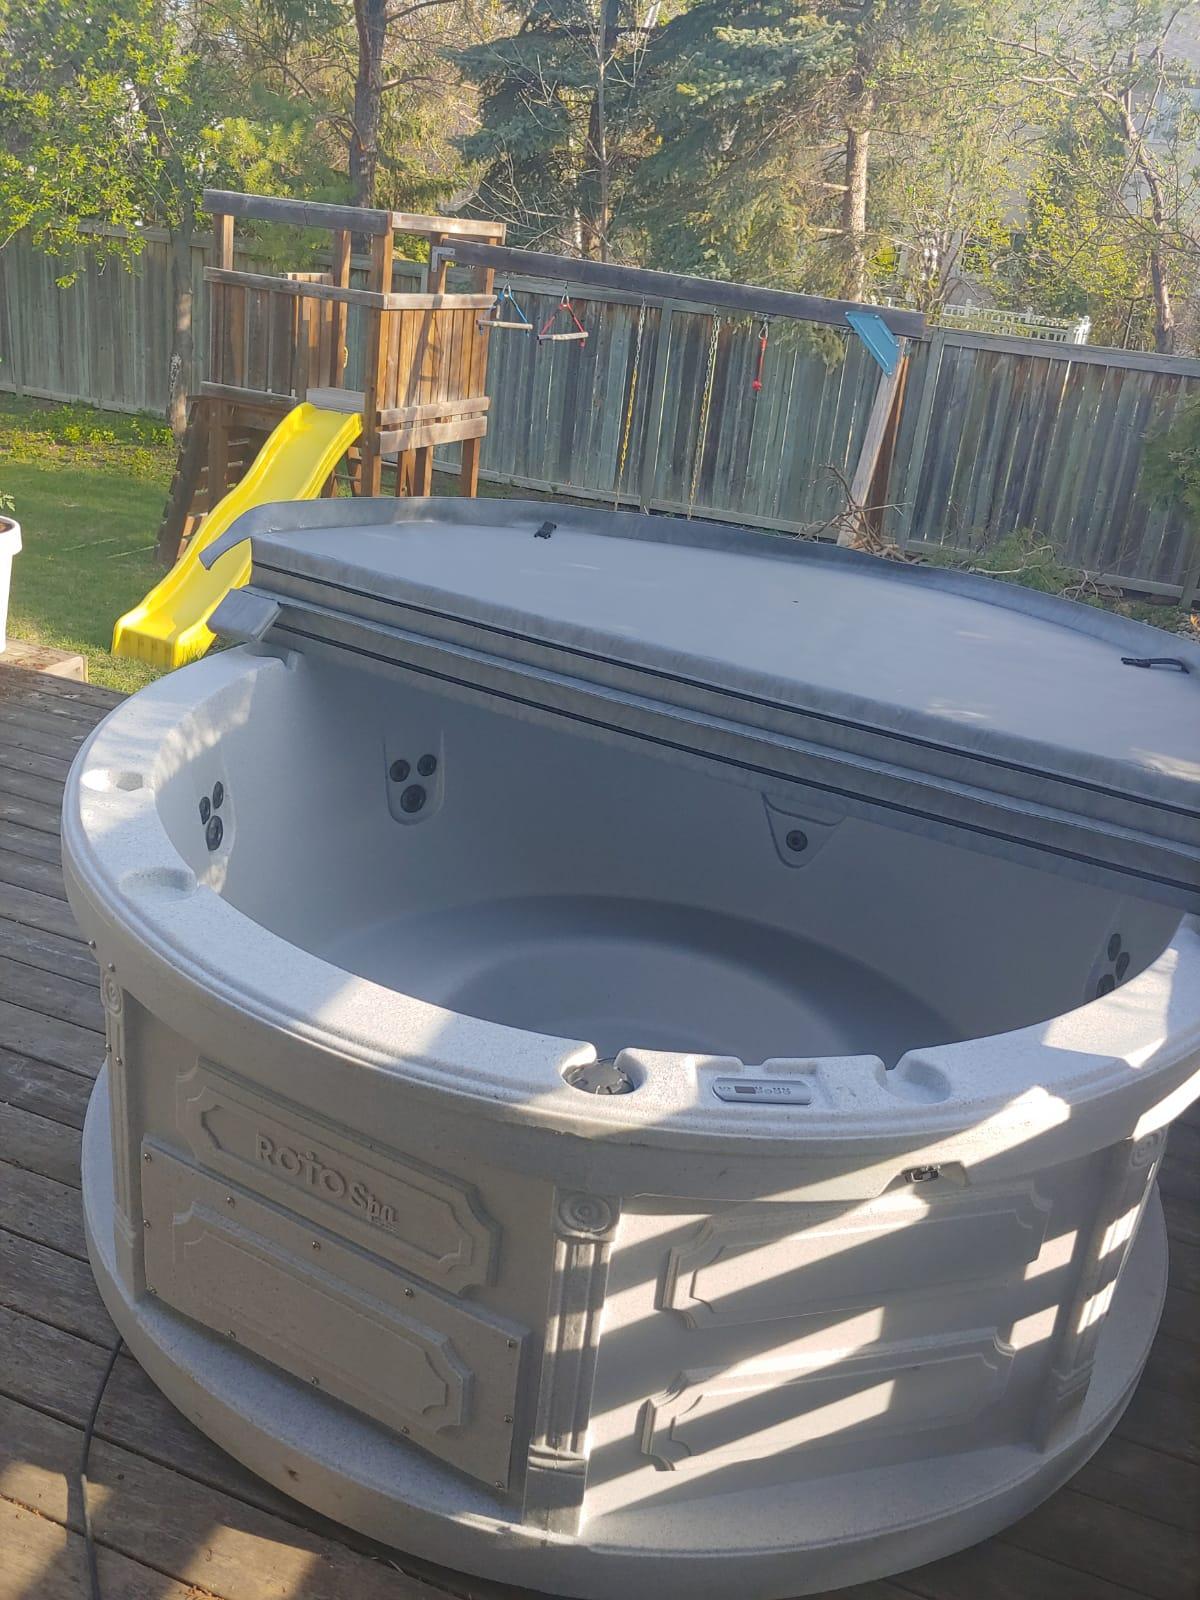 Rent-a-hot-tub-Steinbach-Manitoba-The-Funky-Keg